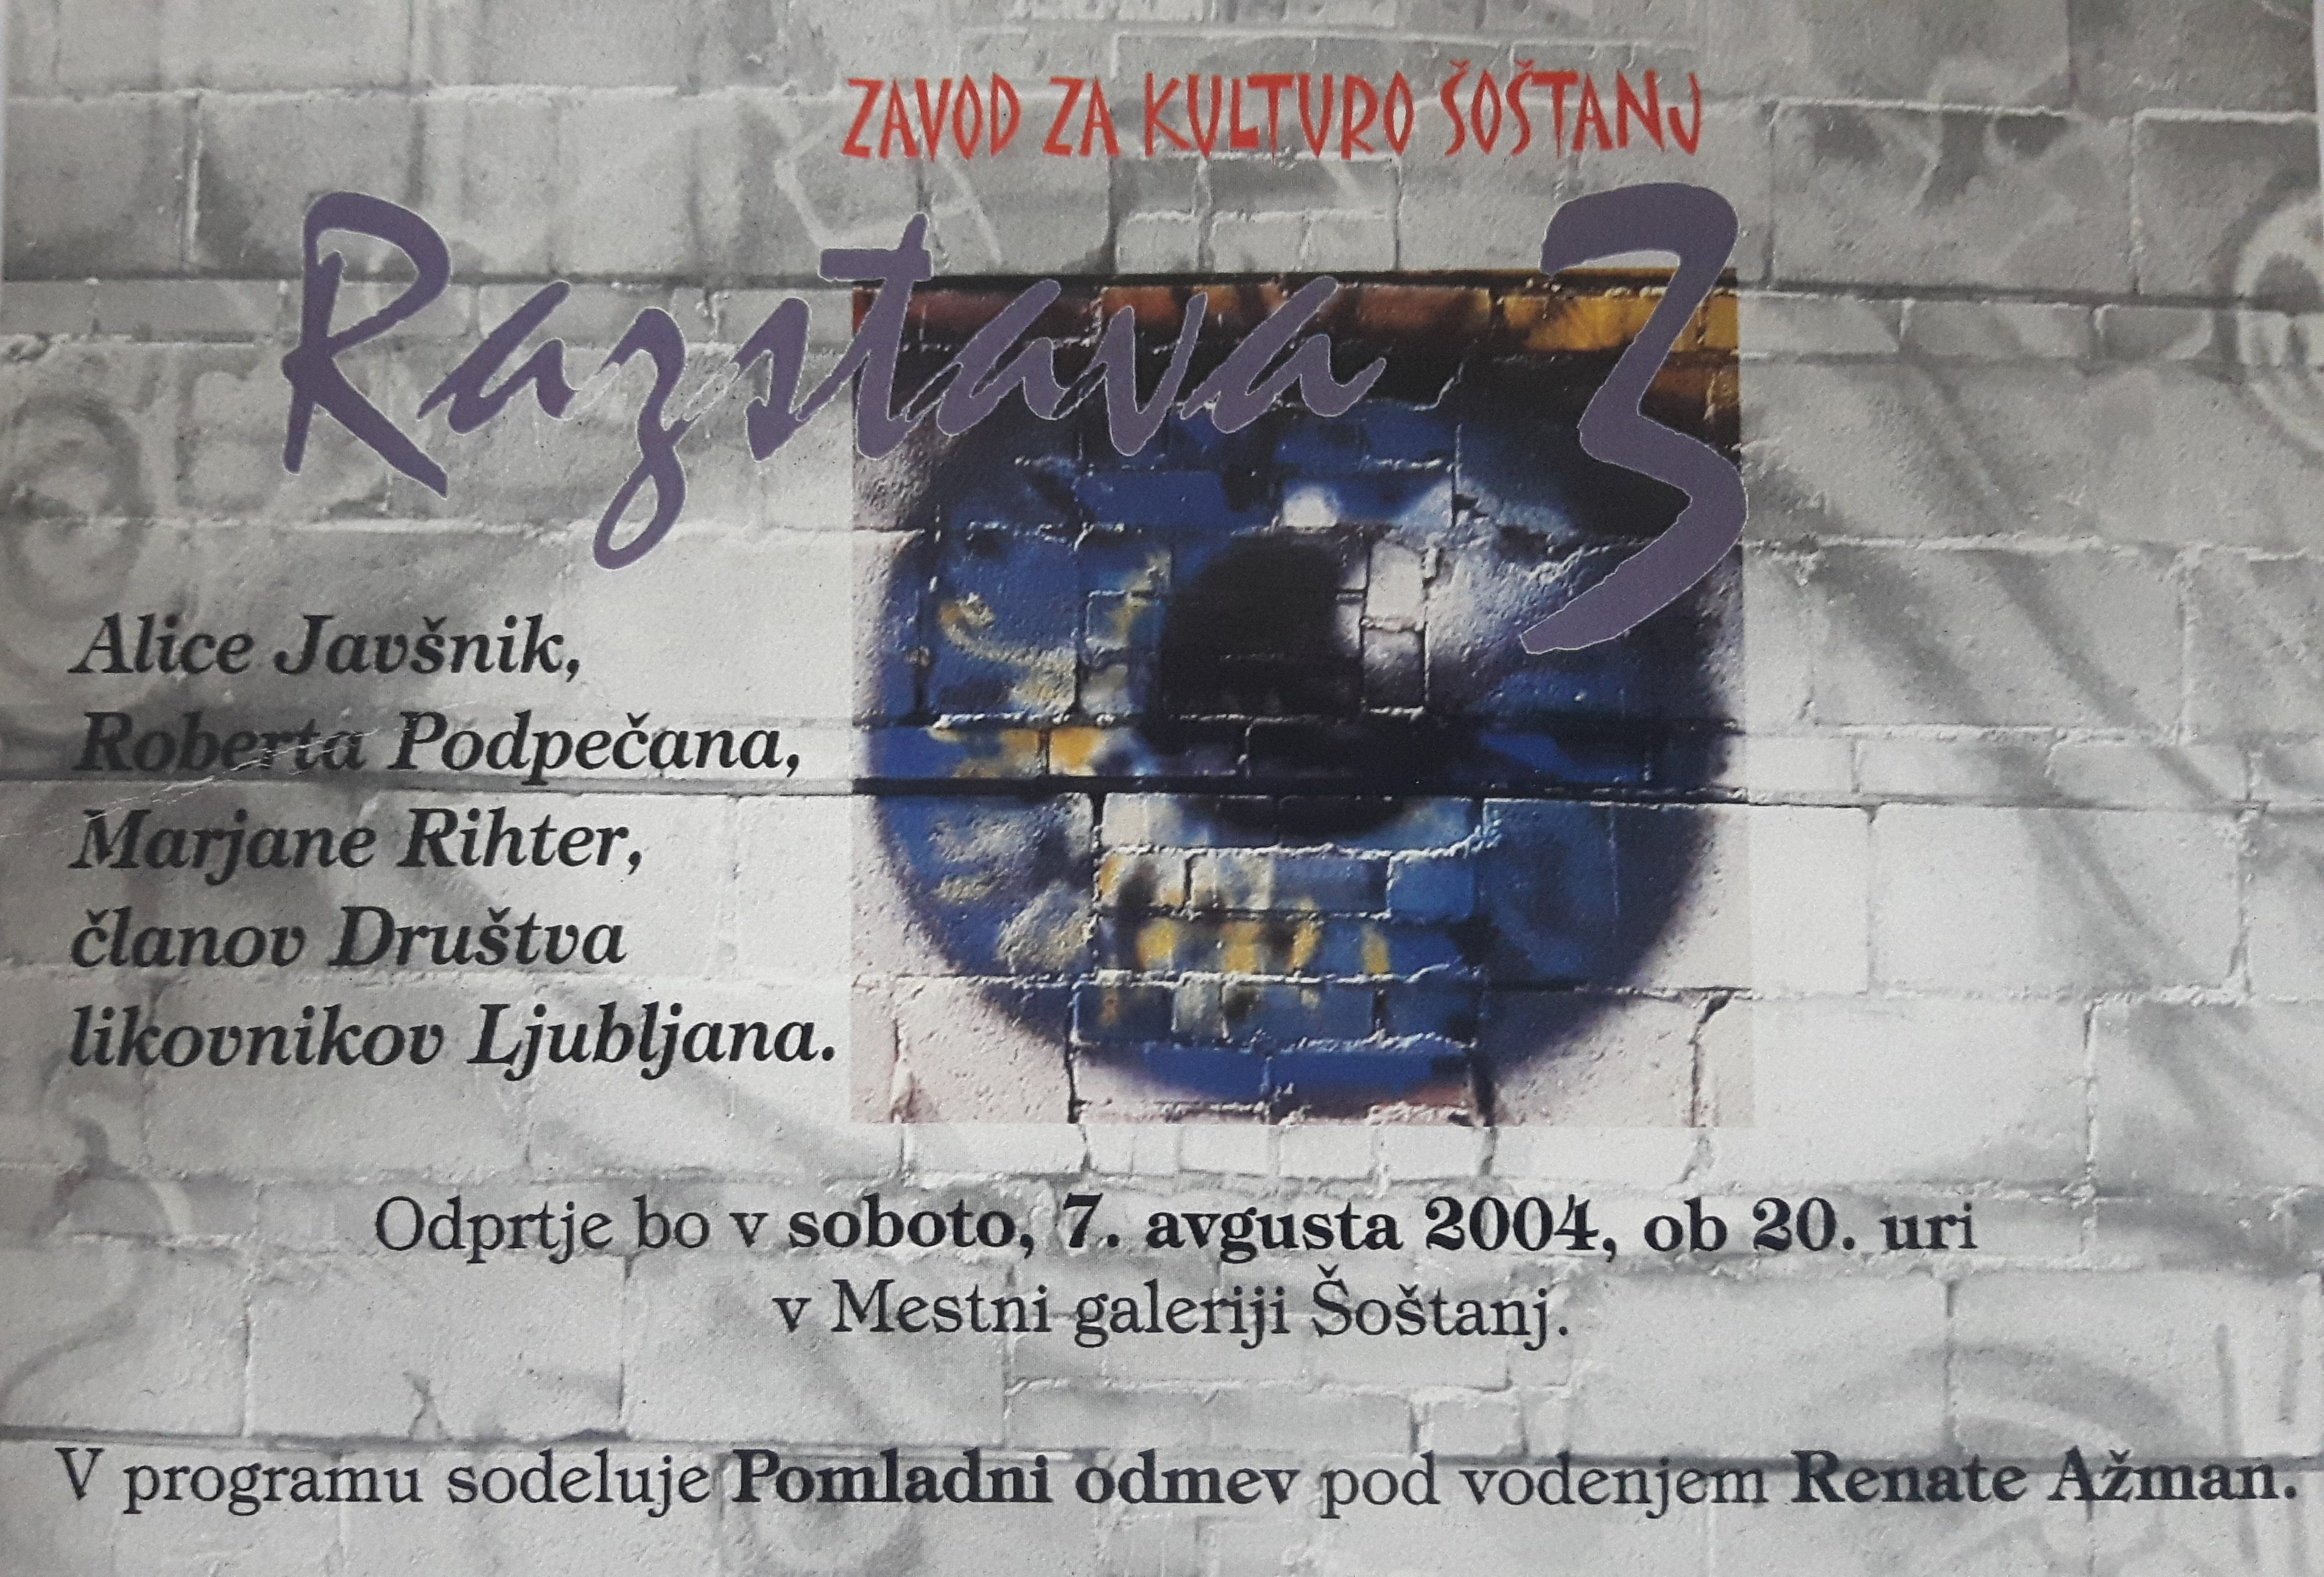 Razstava_trojčka_v_Šoštanju_2004_1